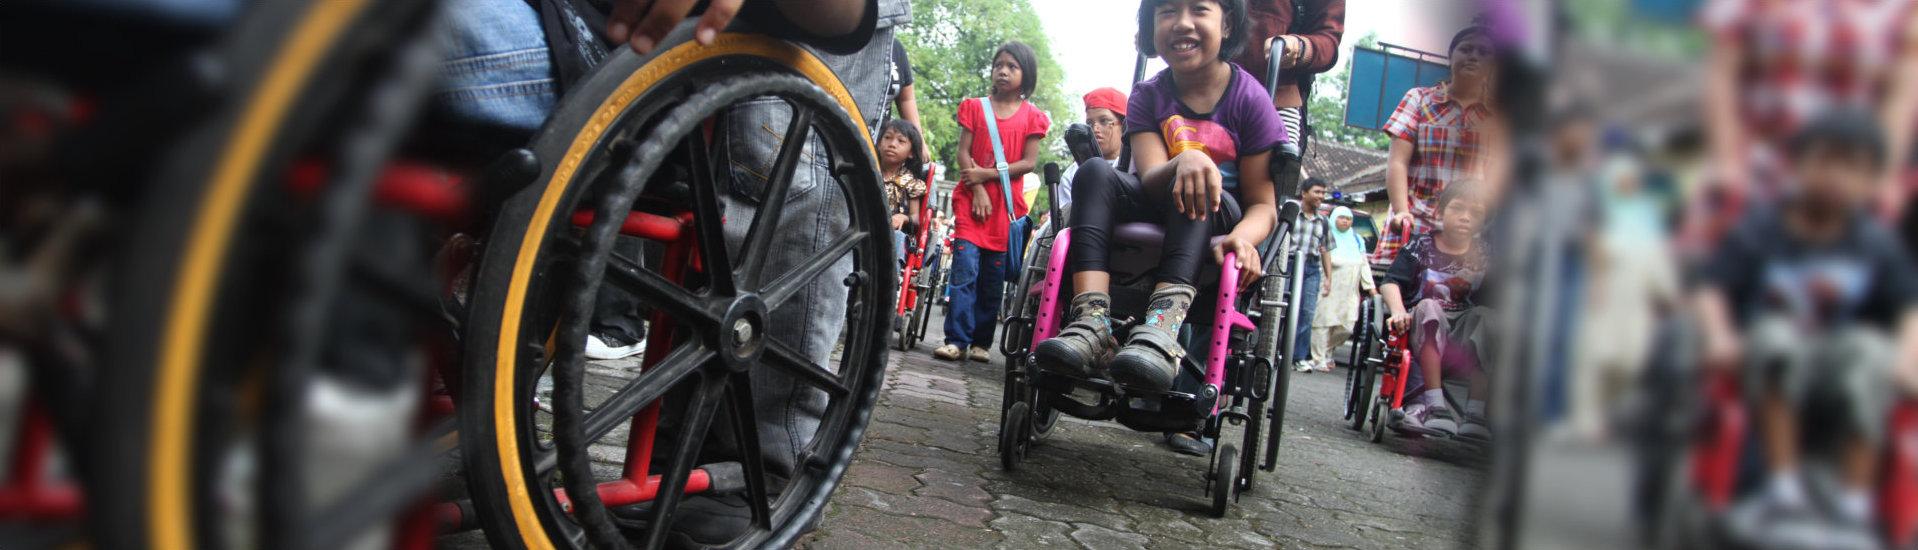 kids on their wheelchair